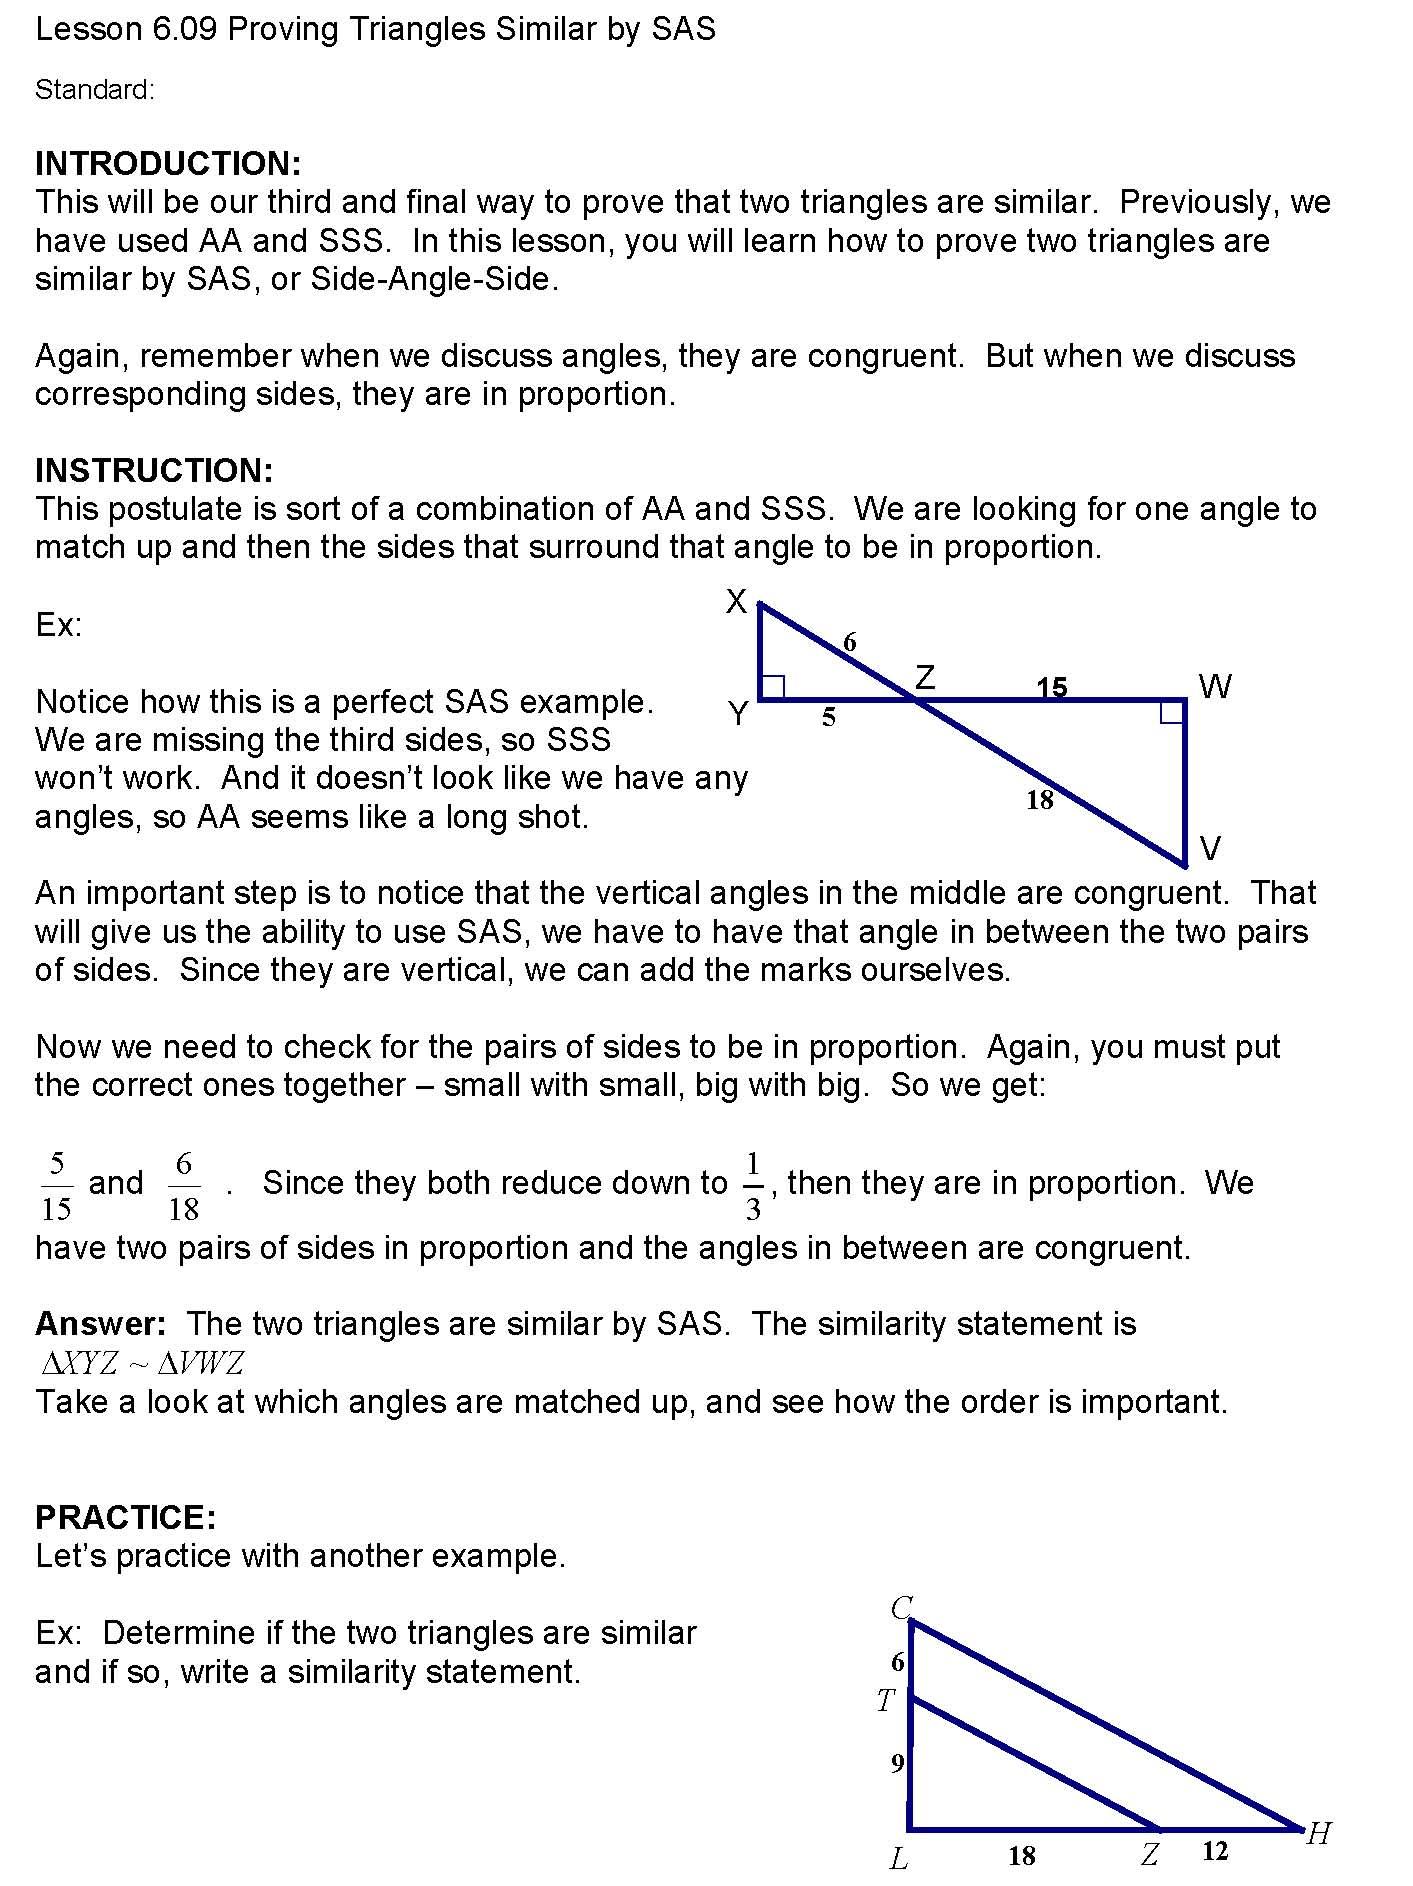 Cosgeometry Lesson 6 09 Proving Triangles Similar By Sas